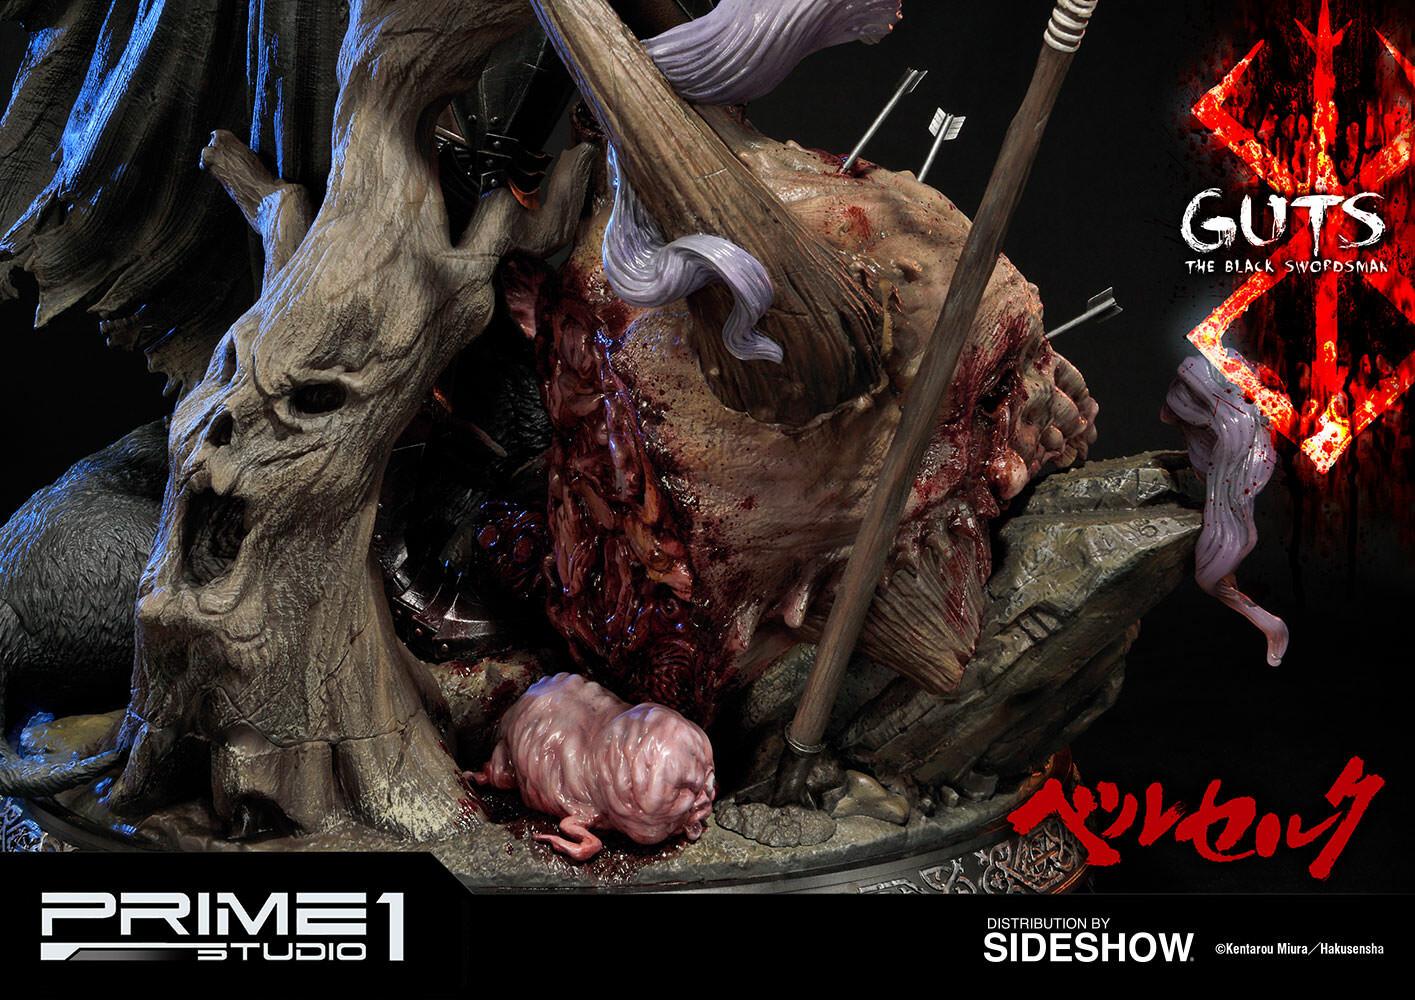 Alvaro ribeiro berserker guts the black swordsman statue prime1 studio 902975 36